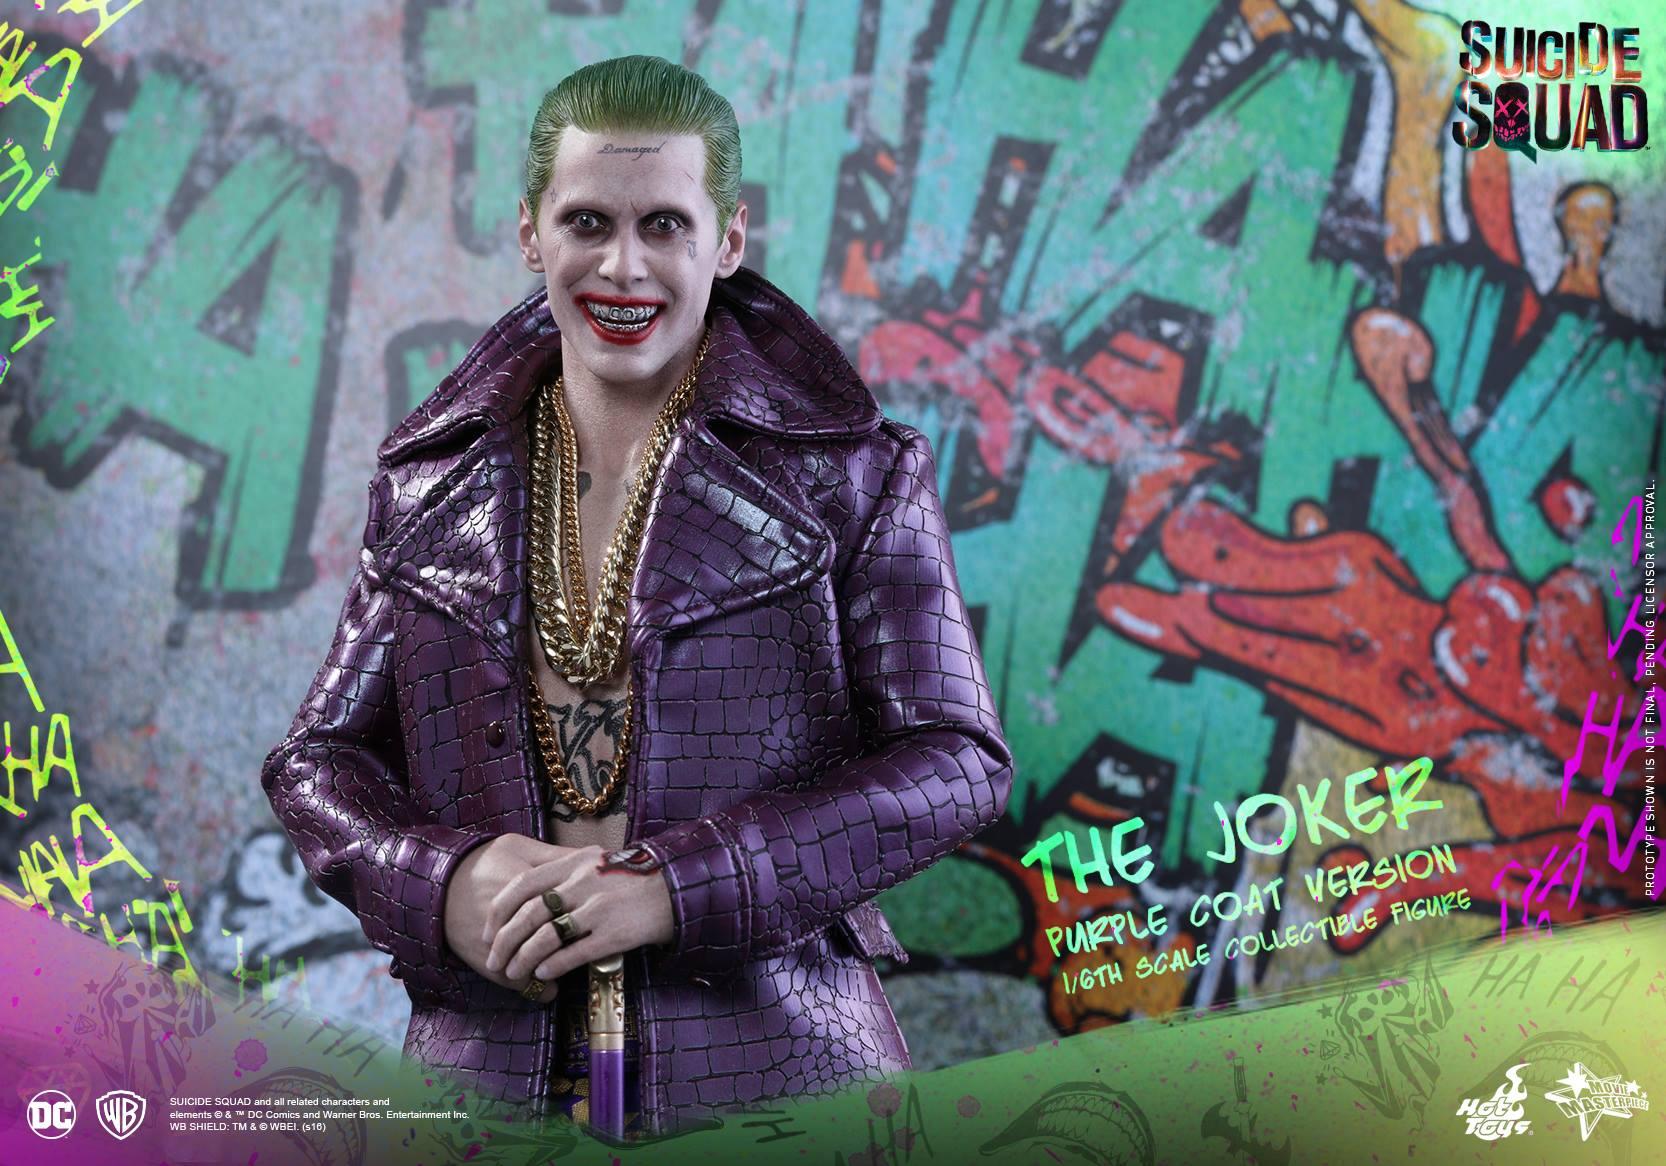 Hot-Toys-Suicide-Squad-Joker-Purple-Coat-9